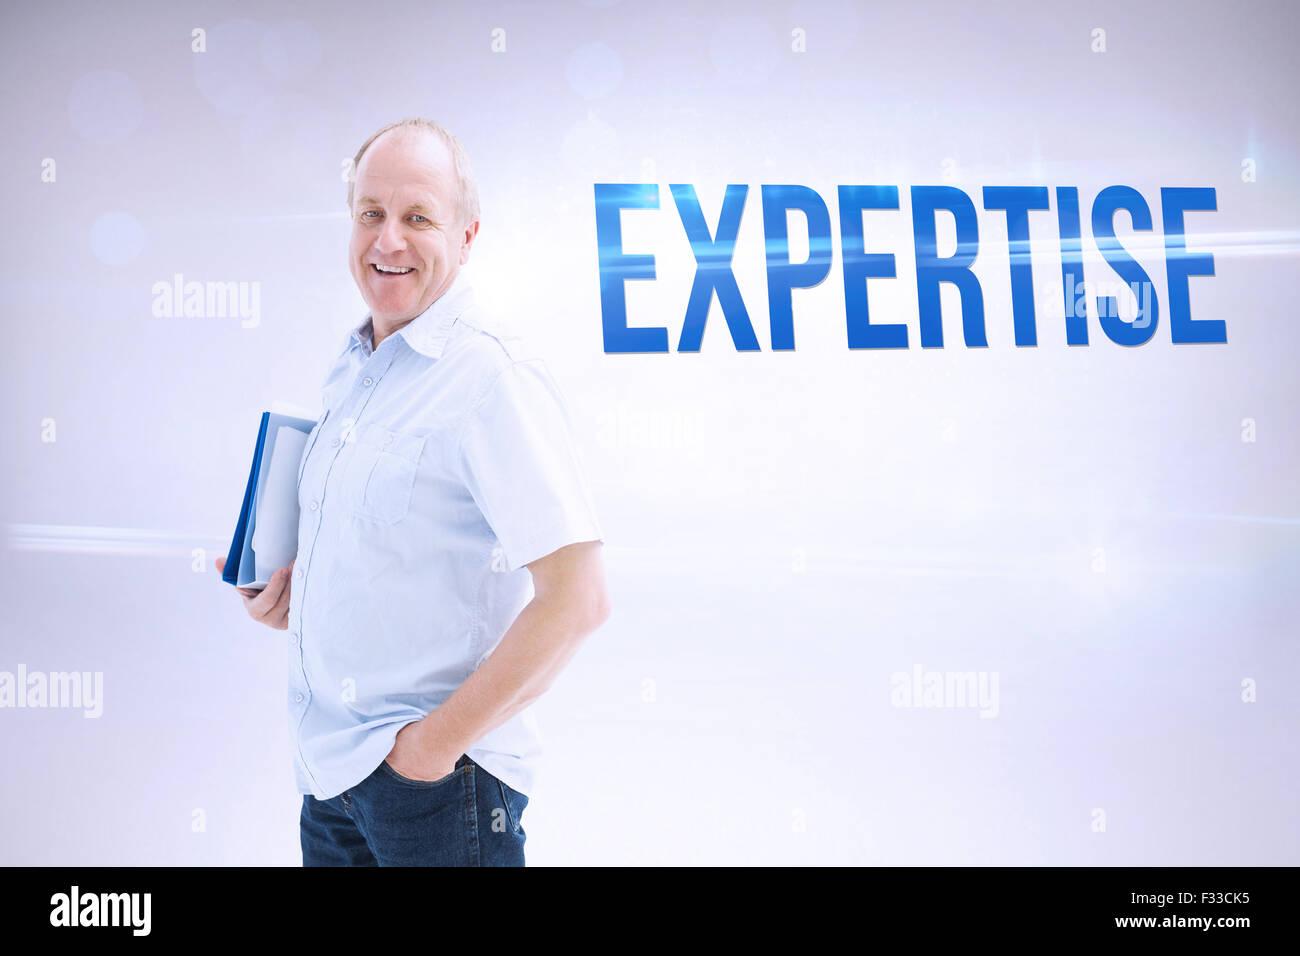 Expertise against grey background - Stock Image